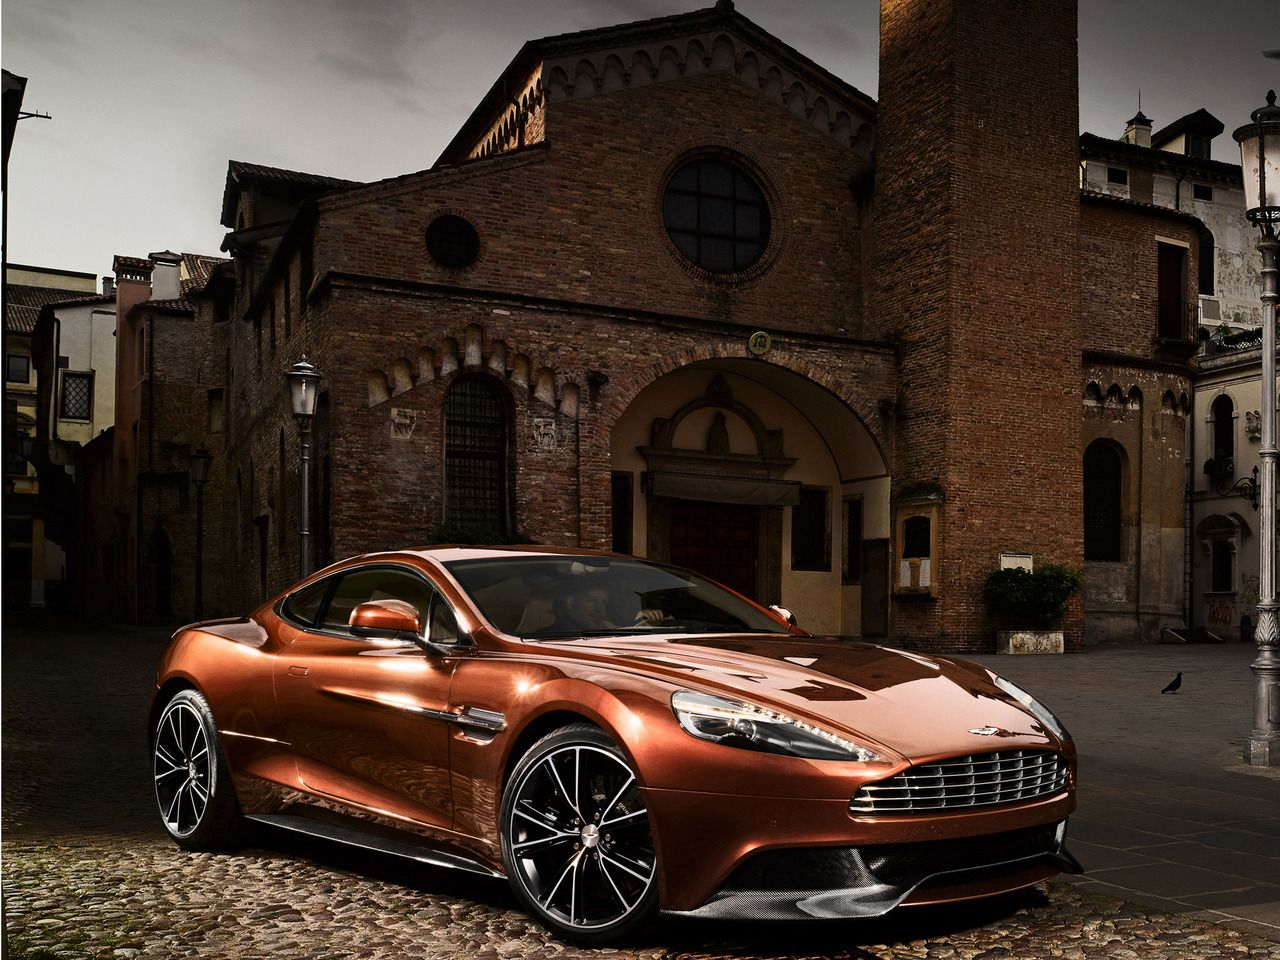 aston martin hot cars pinterest voiture belle voiture and voiture sportive. Black Bedroom Furniture Sets. Home Design Ideas